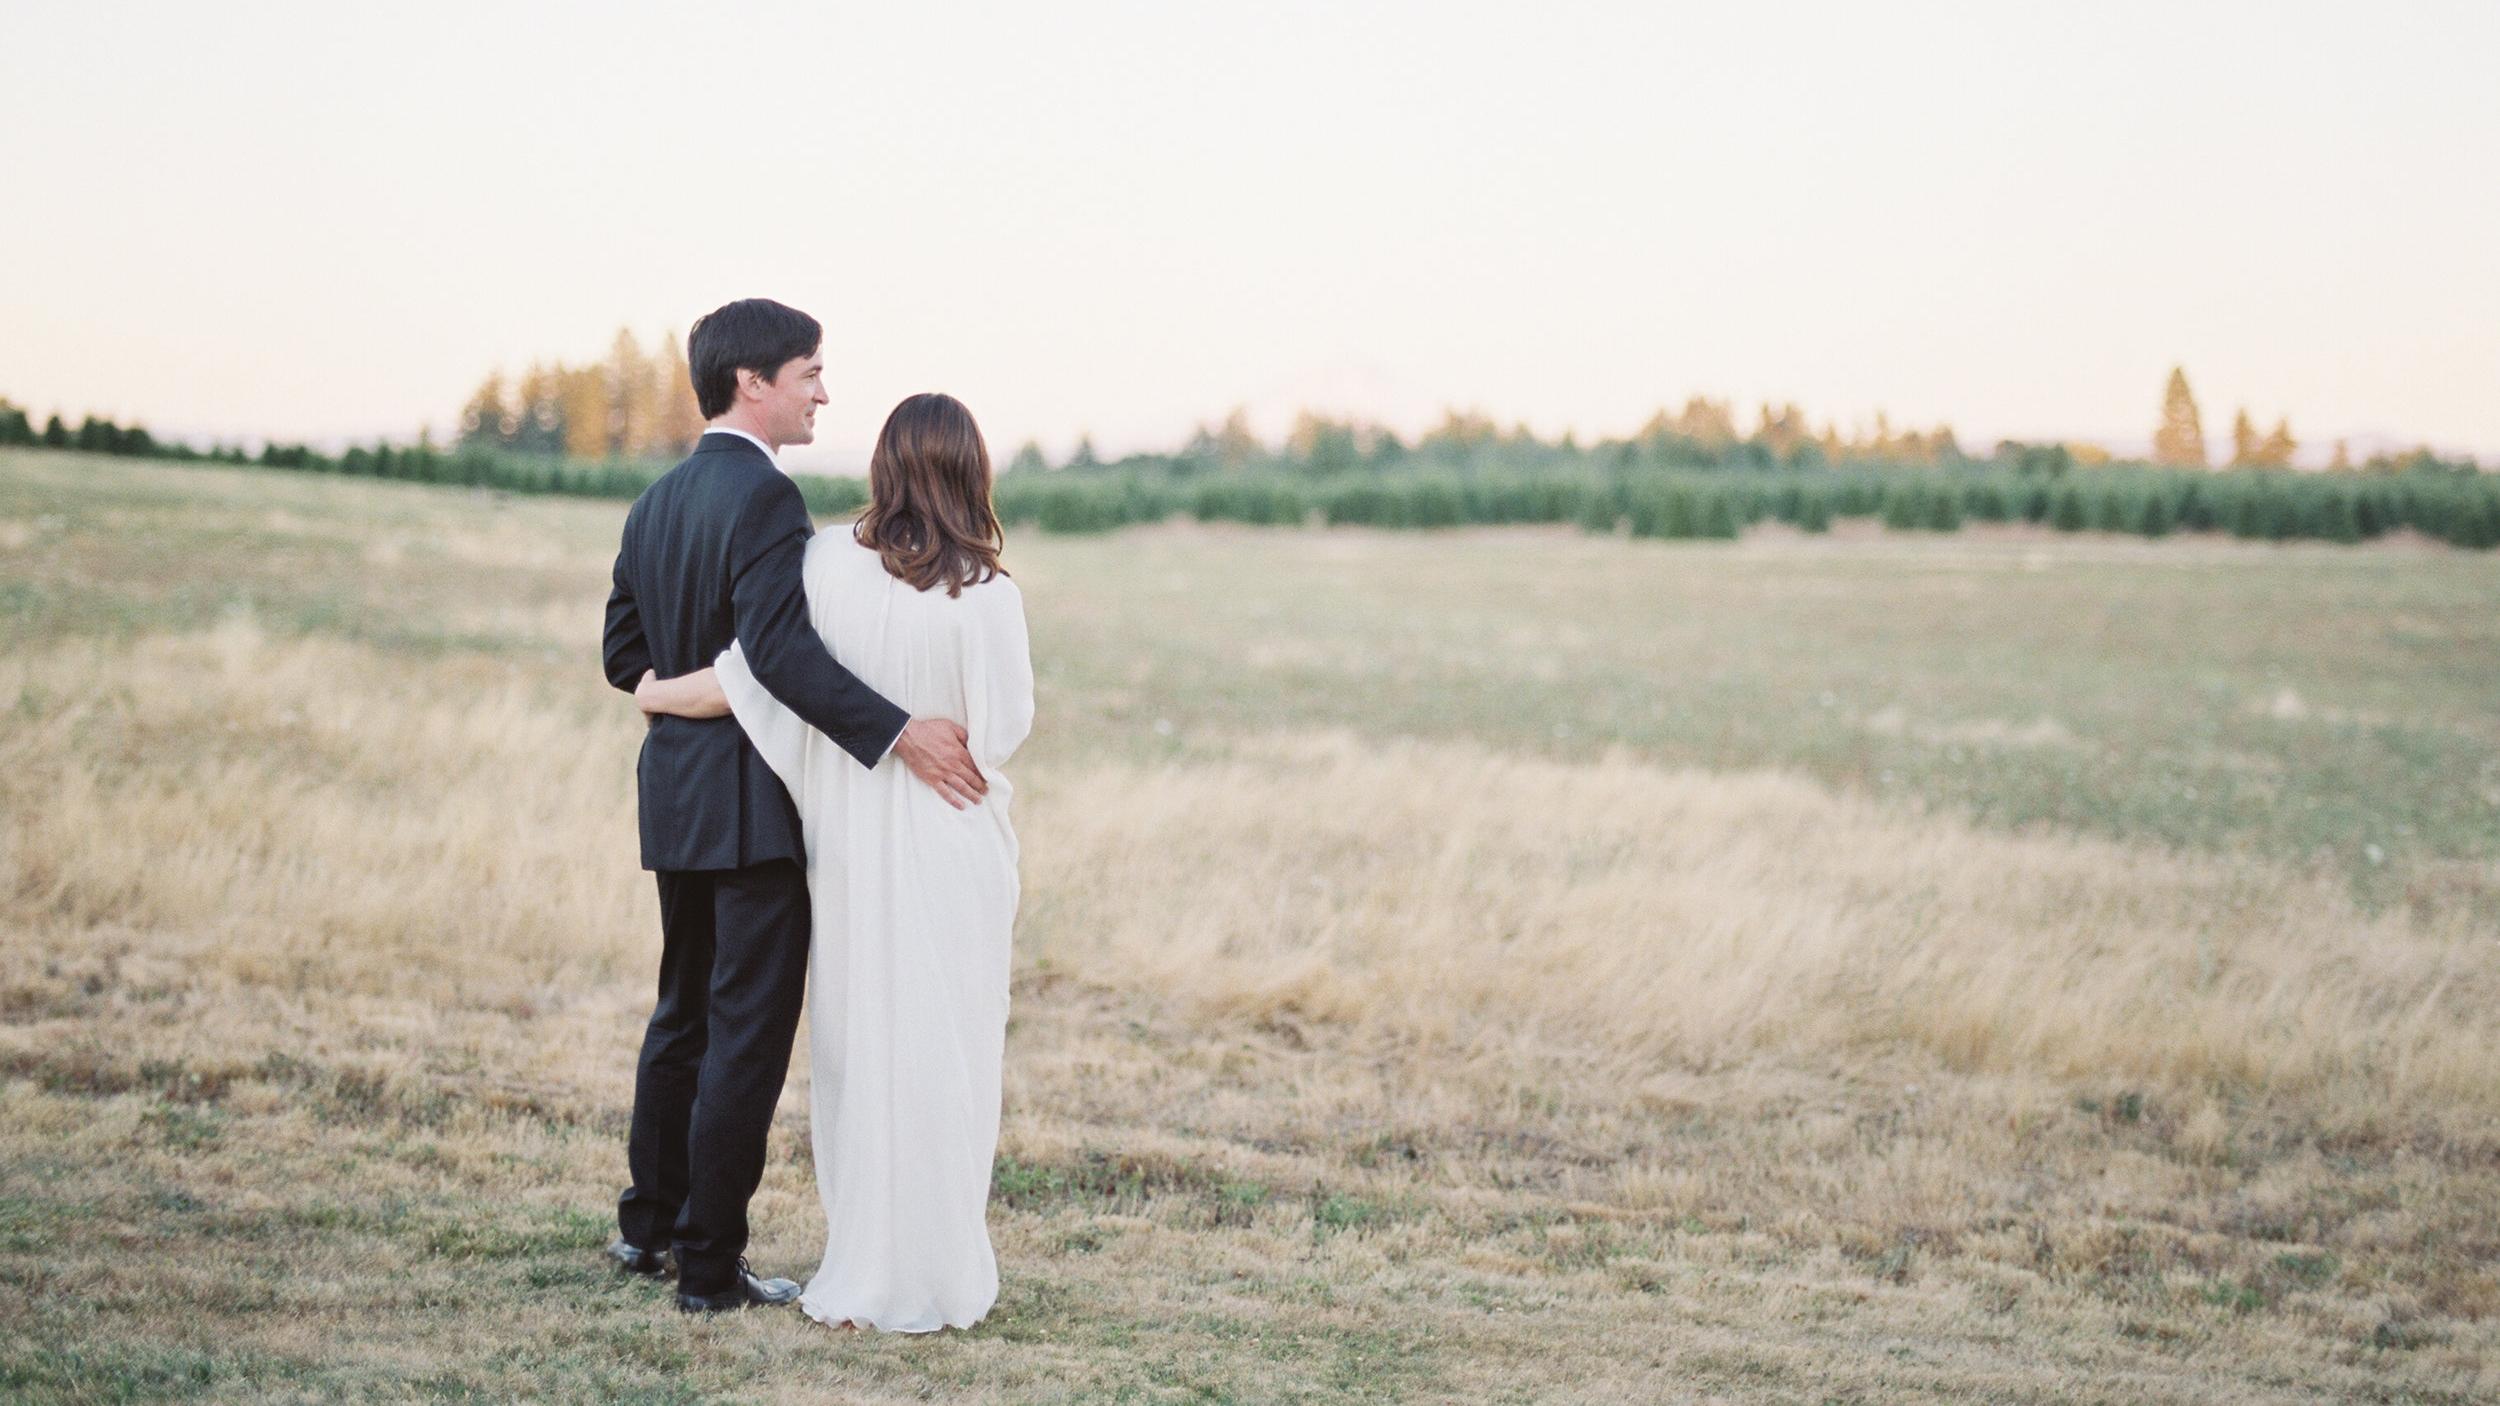 colin-elizabeth-wedding-sunset-portraits-18 copy.jpg